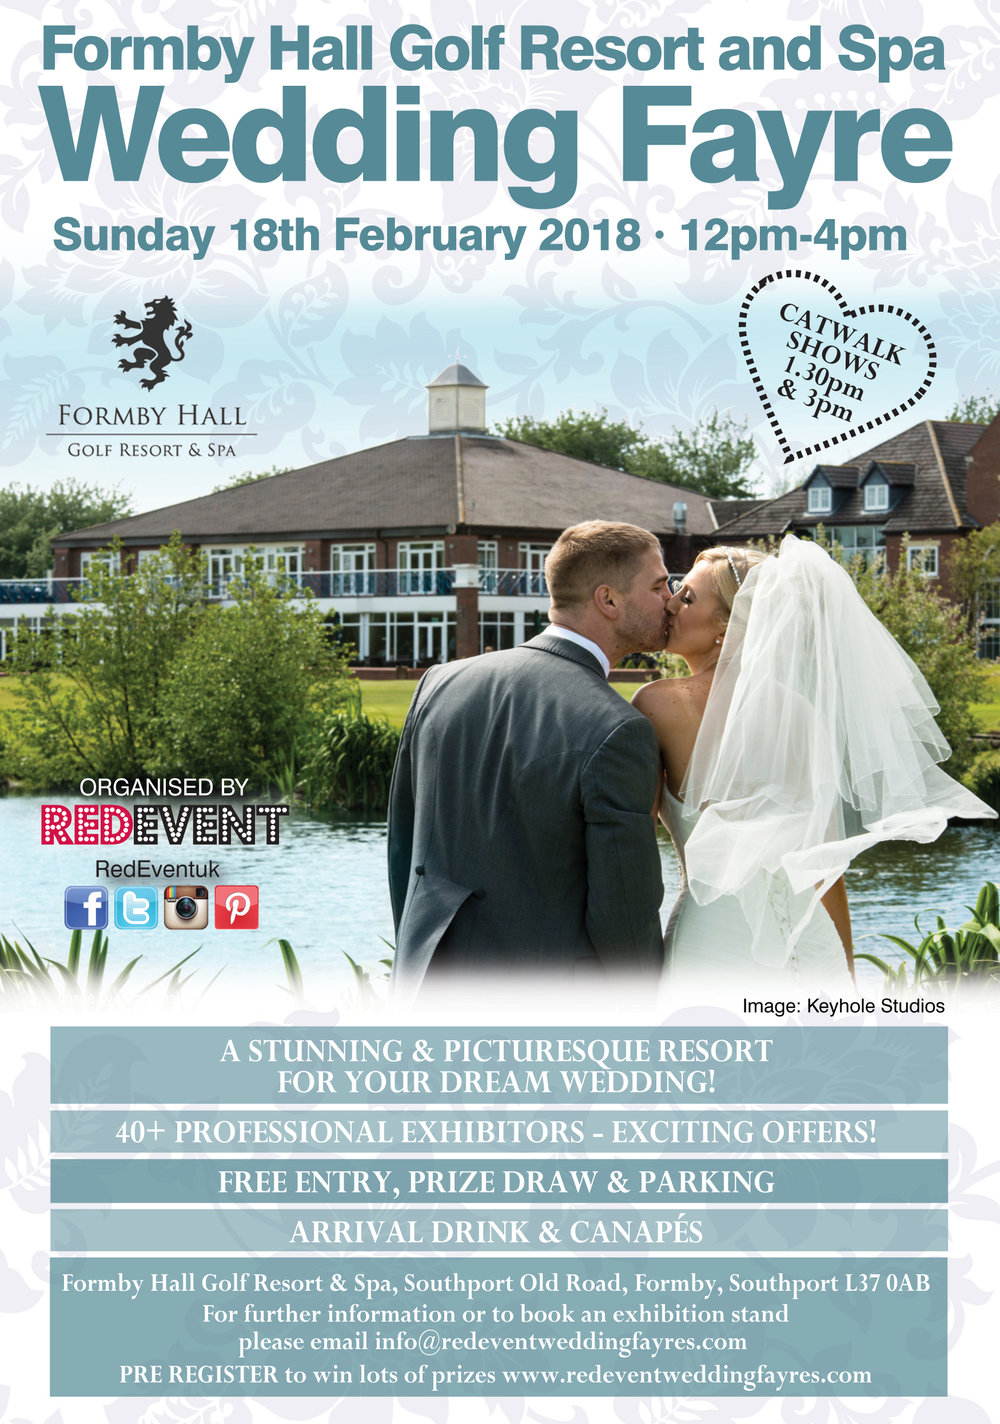 Formby Hall Golf Resort & Spa Liverpool Wedding Fayre Red Event.jpg